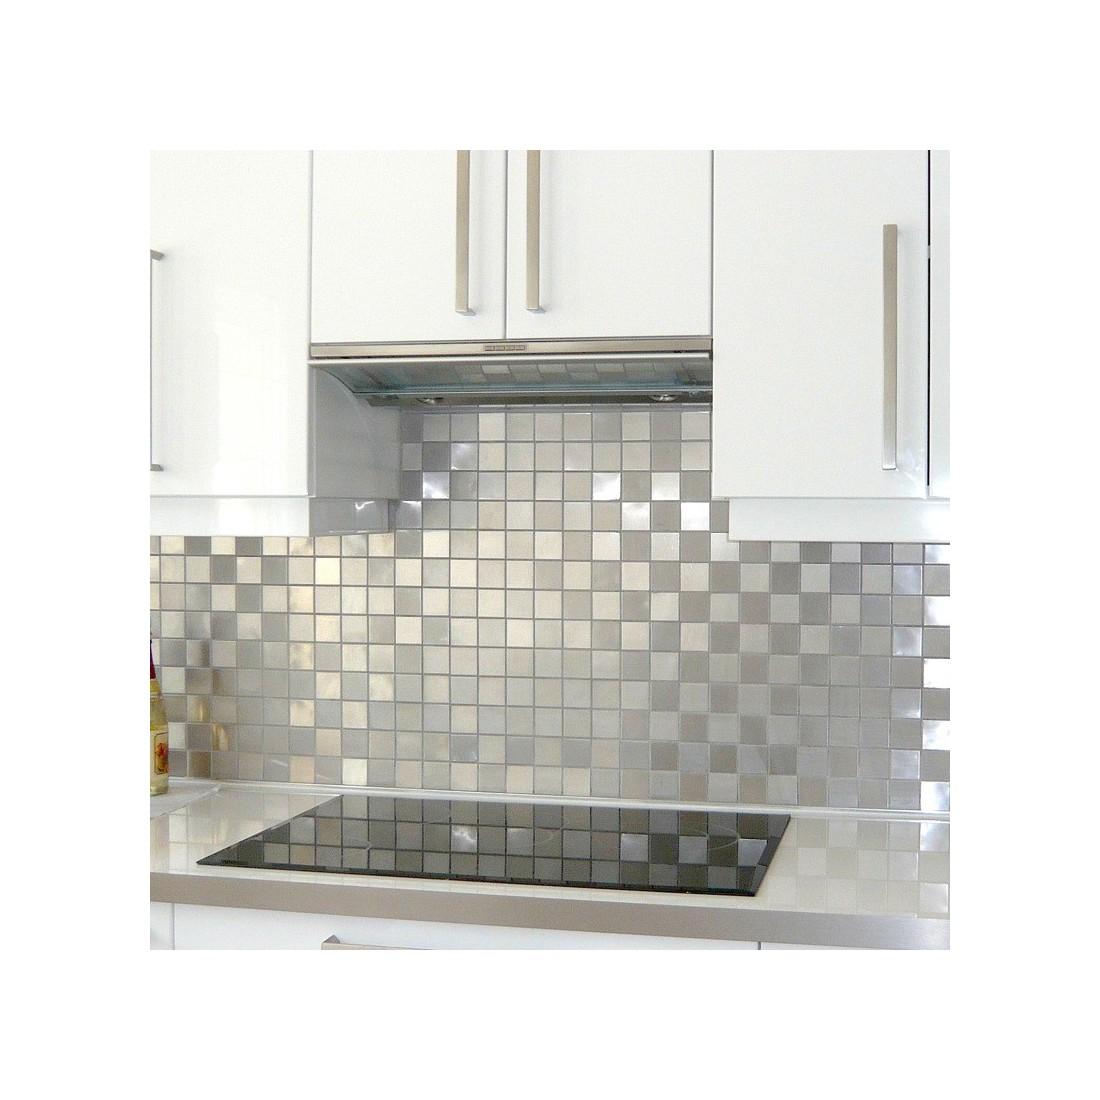 Mosaique et carrelage inox faience credence damier 48 - Faience pour credence cuisine ...